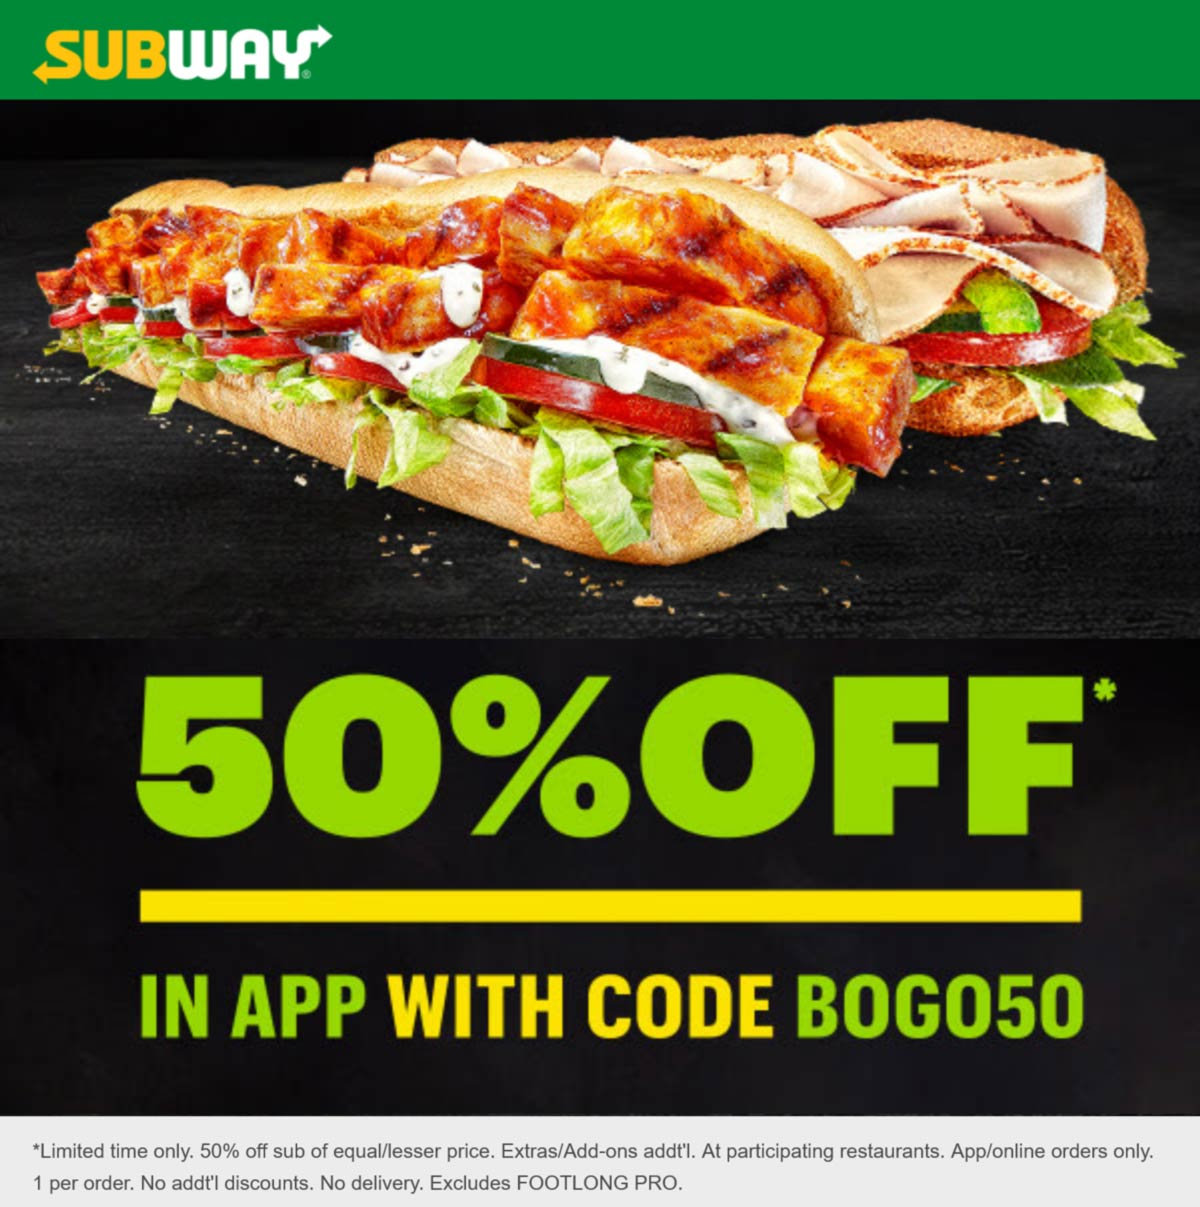 Subway restaurants Coupon  Second sub sandwich 50% off at Subway via promo code BOGO50 #subway